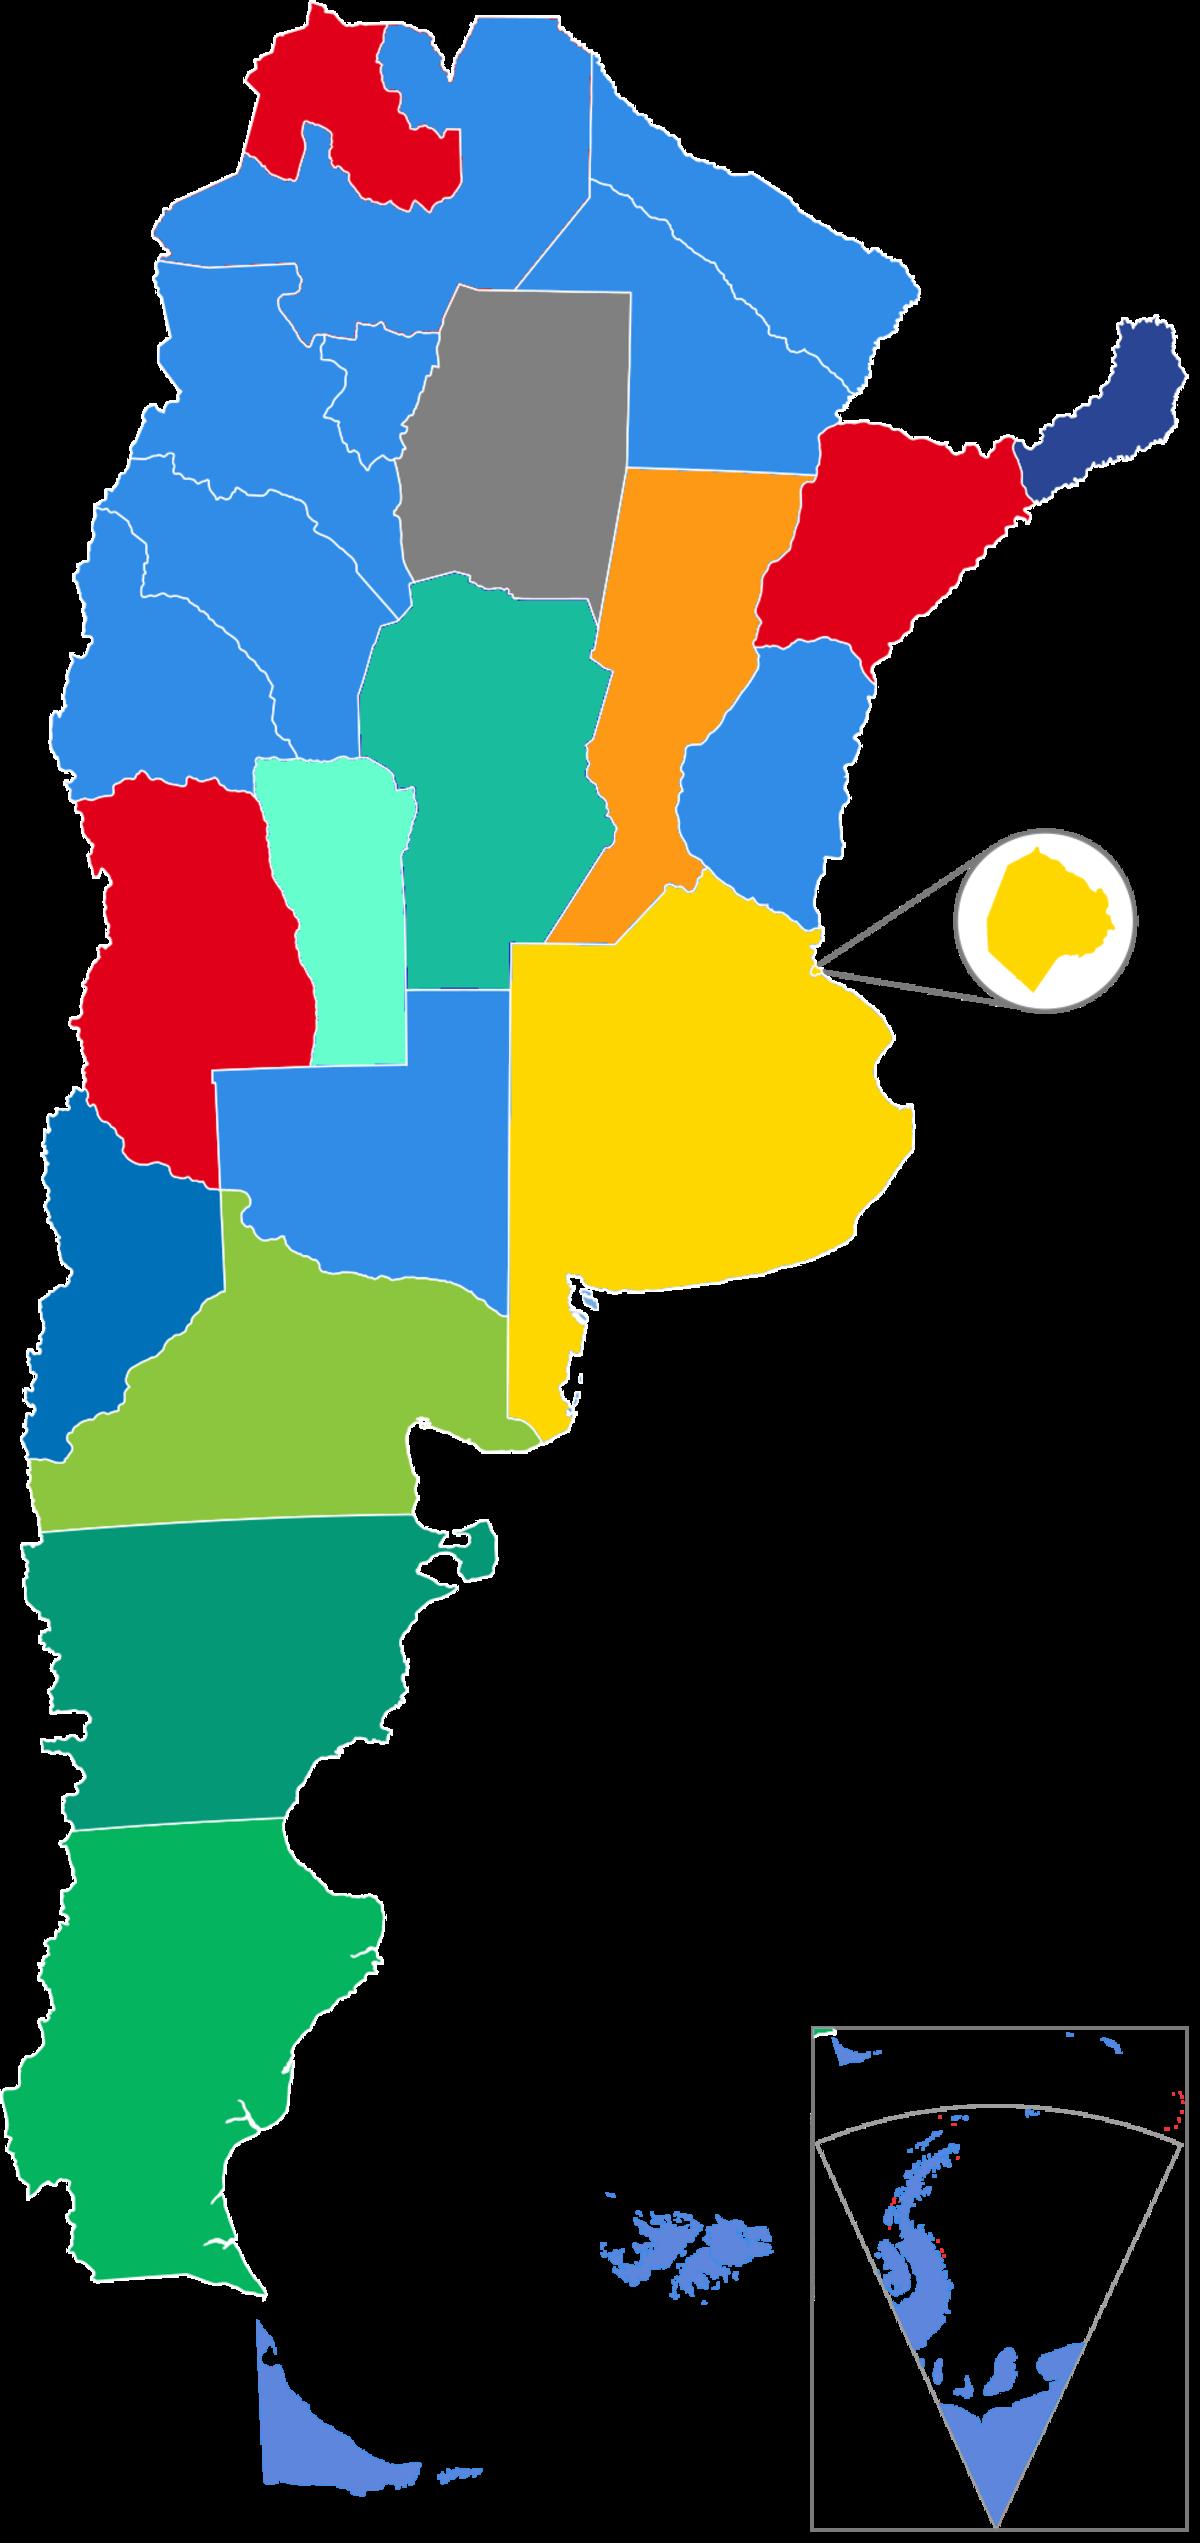 14 de diciembre de 2015 - 1 1